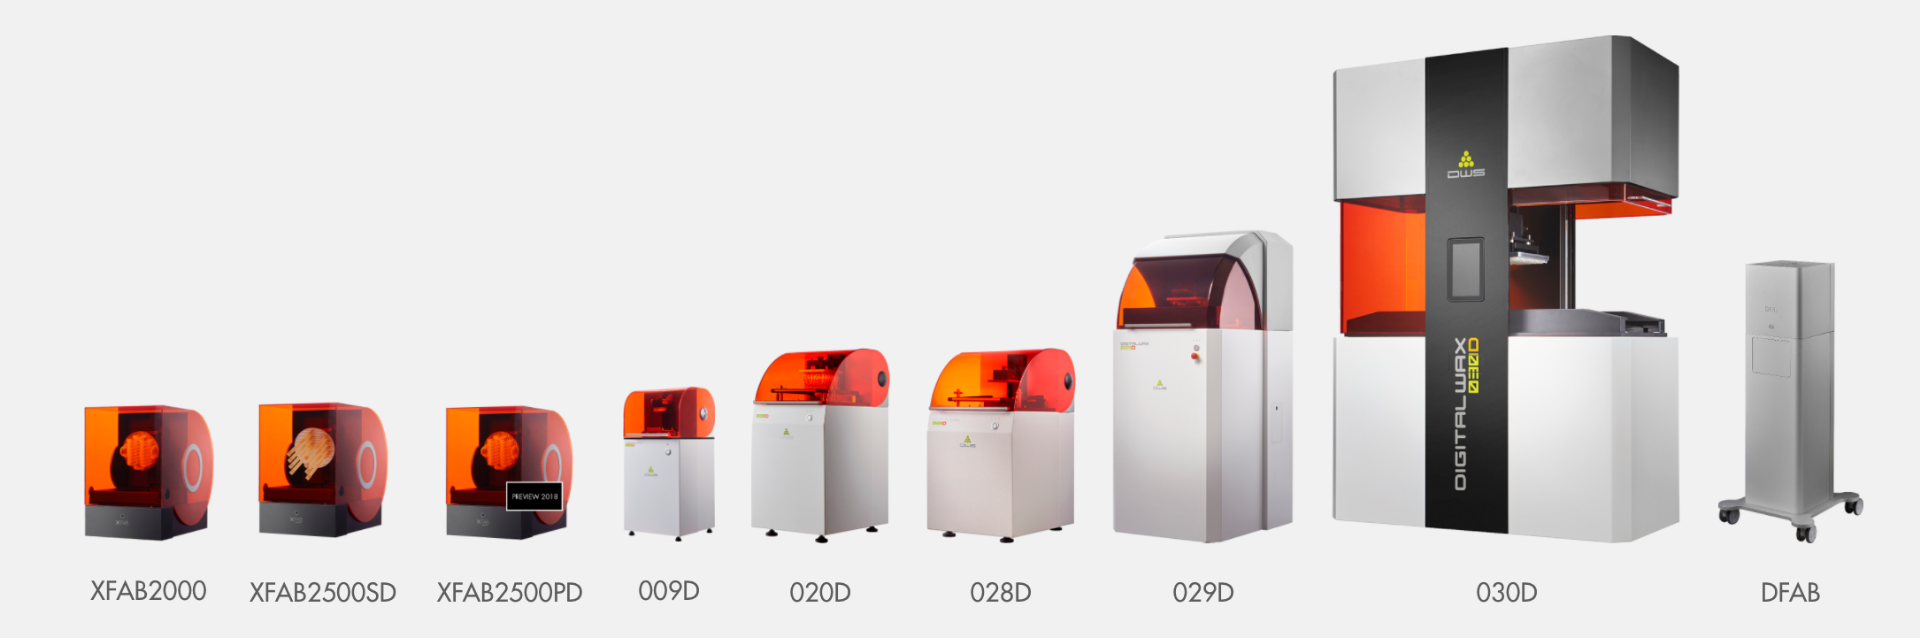 Impresora 3d DWS XFAB